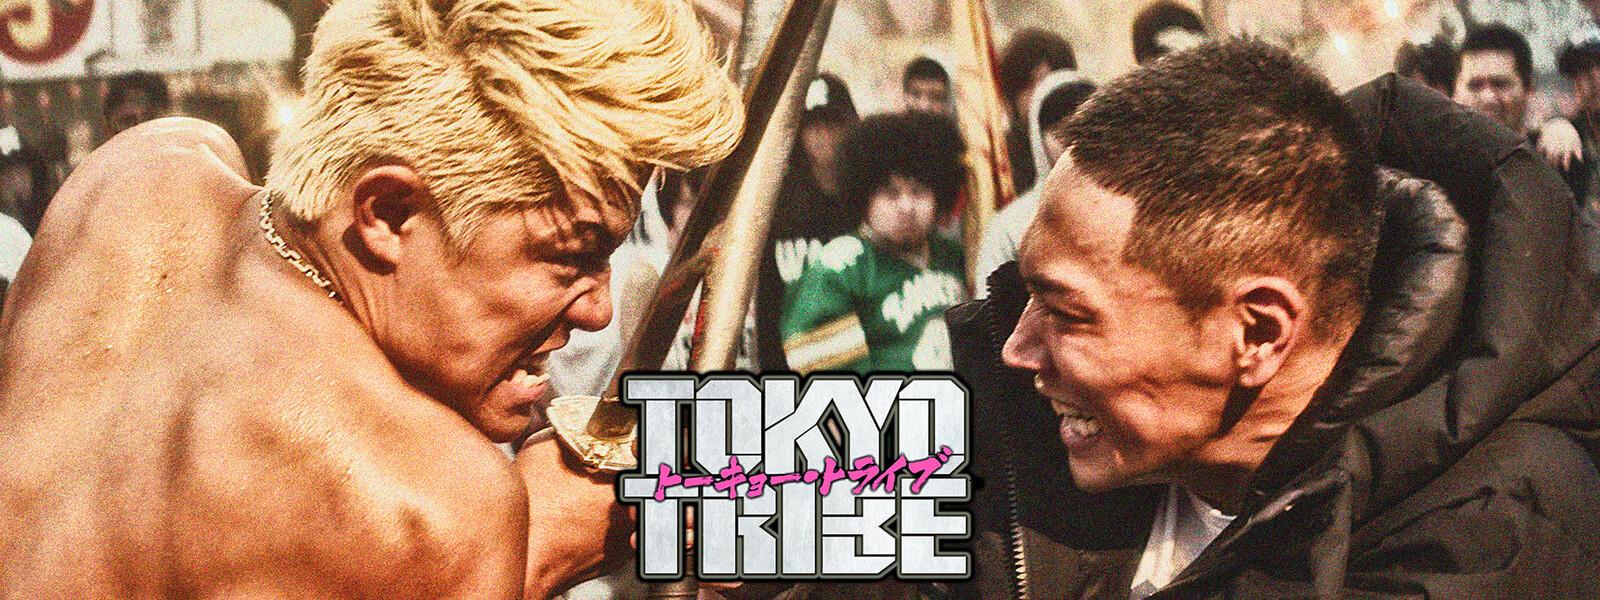 Hulu TOKYO TRIBE はこちら